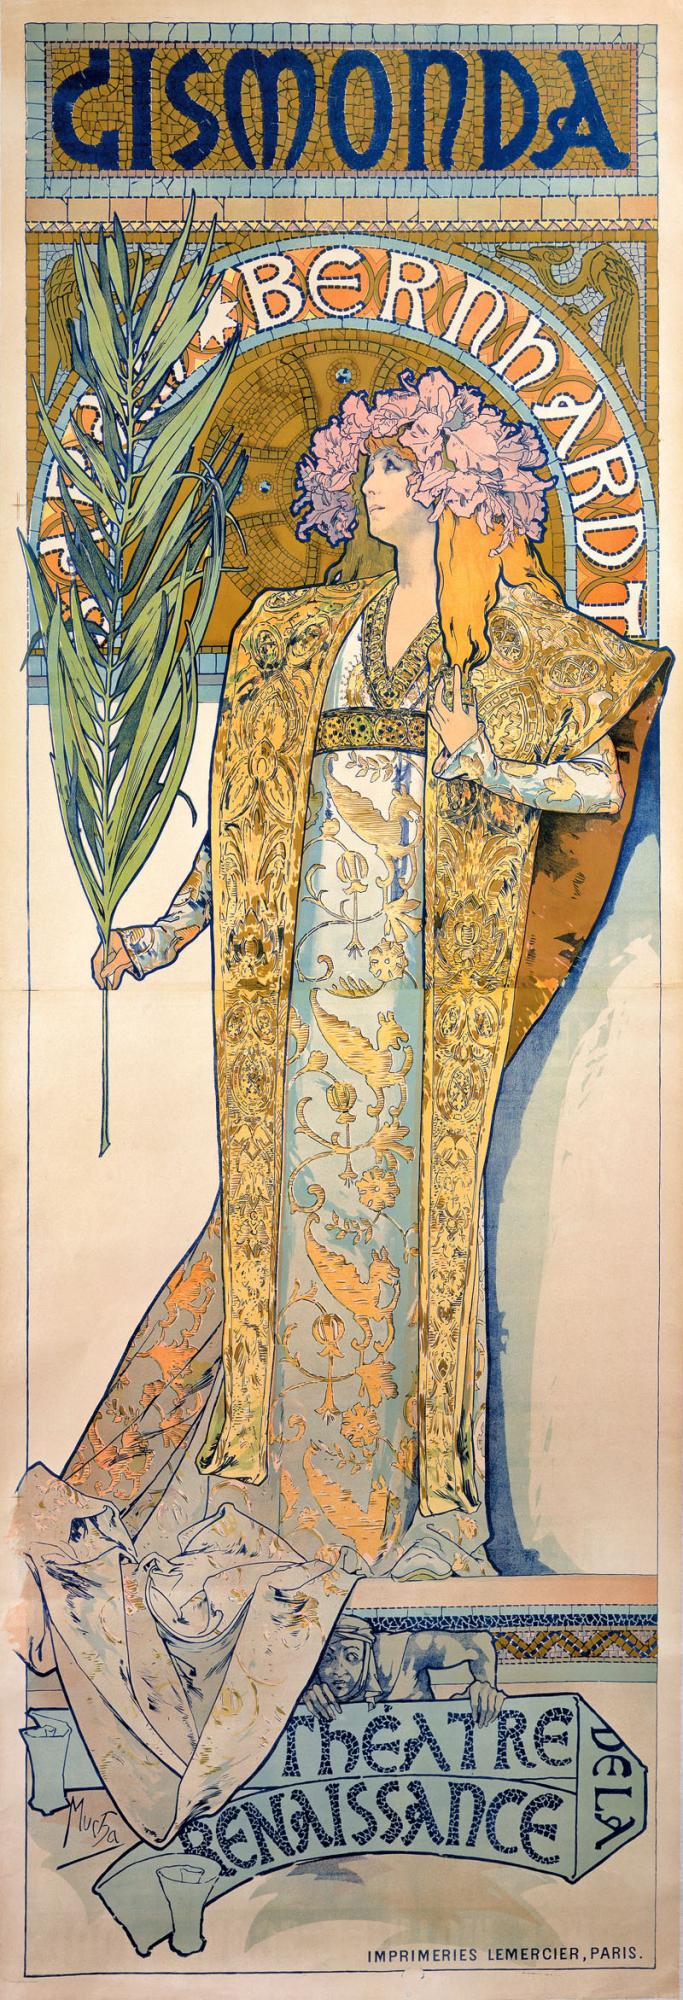 Gismonda, Alphonse Mucha, 1894, http://www.muchafoundation.org/en/gallery/browse-works/object/21